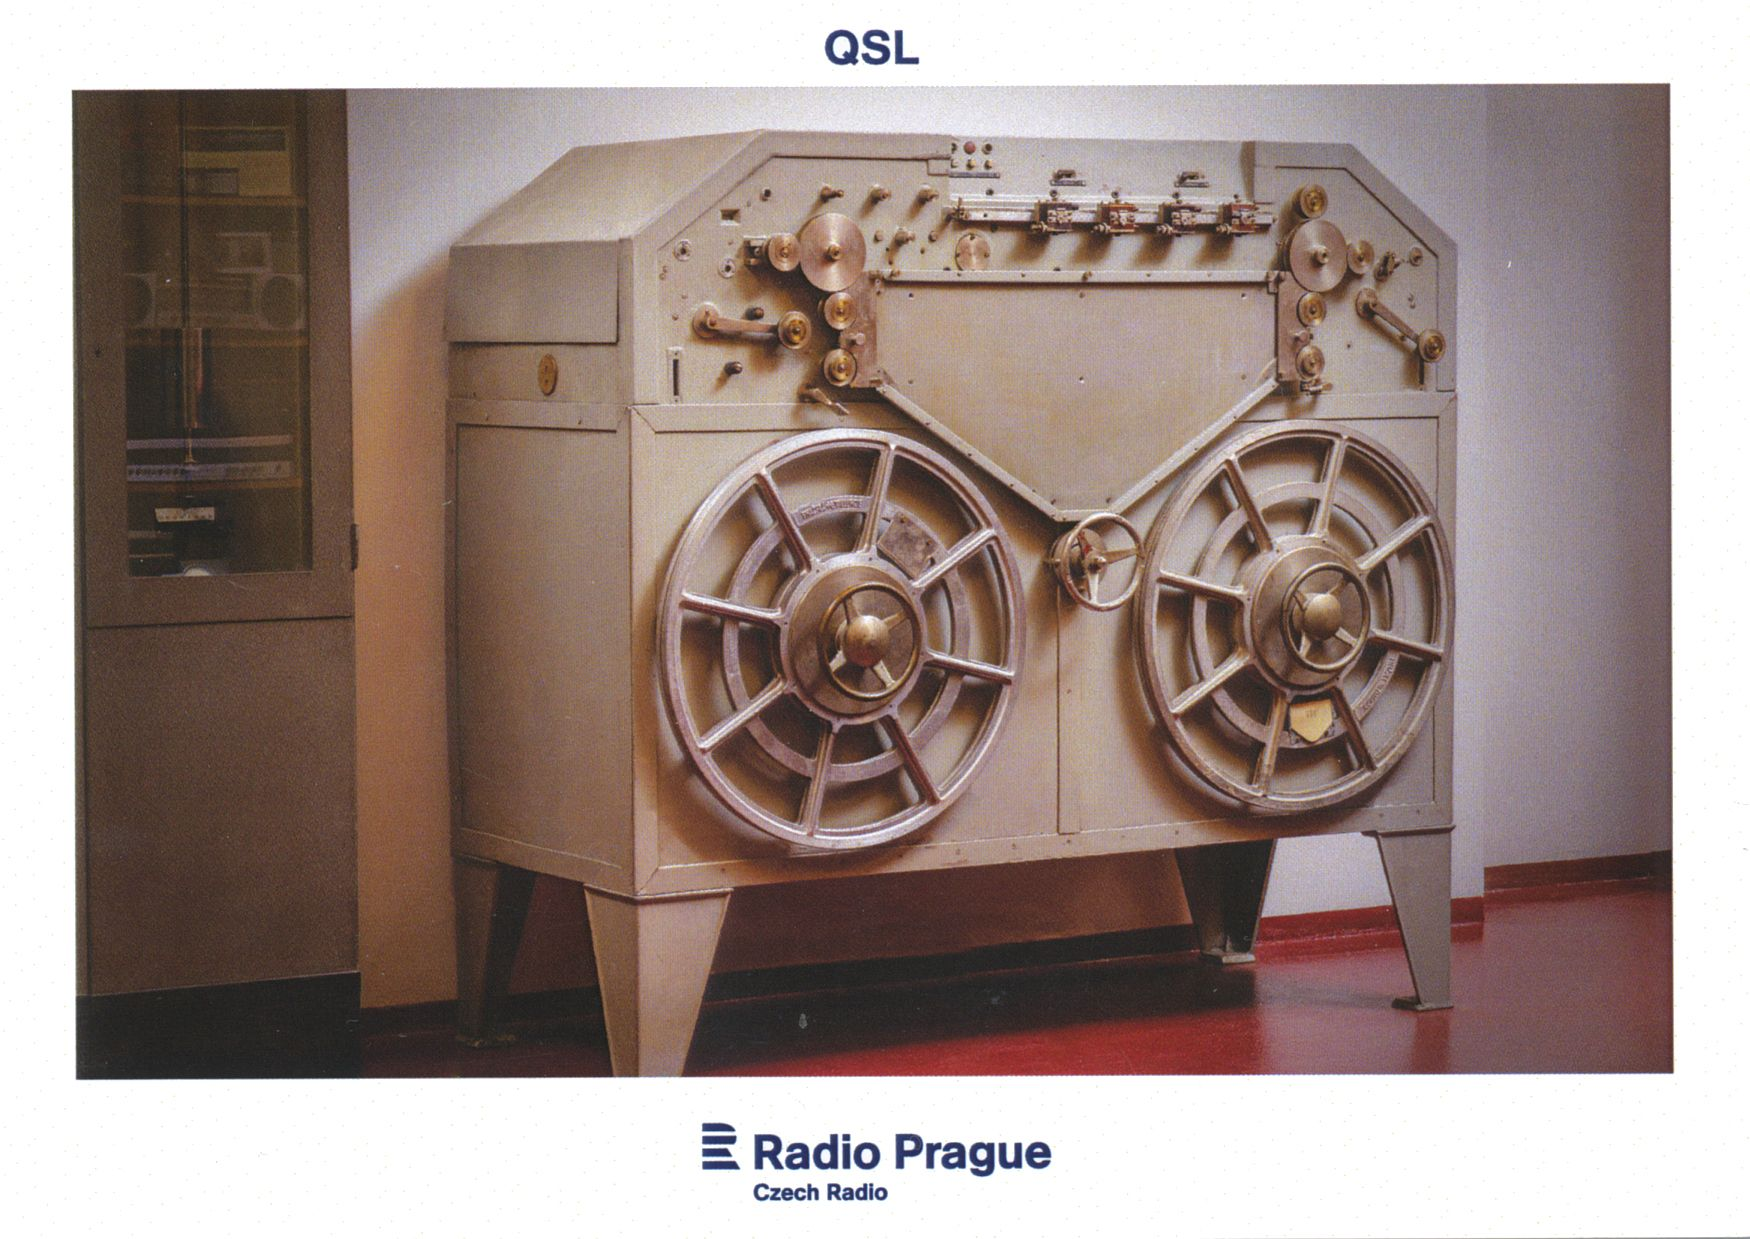 qsl 2018 radio equipment